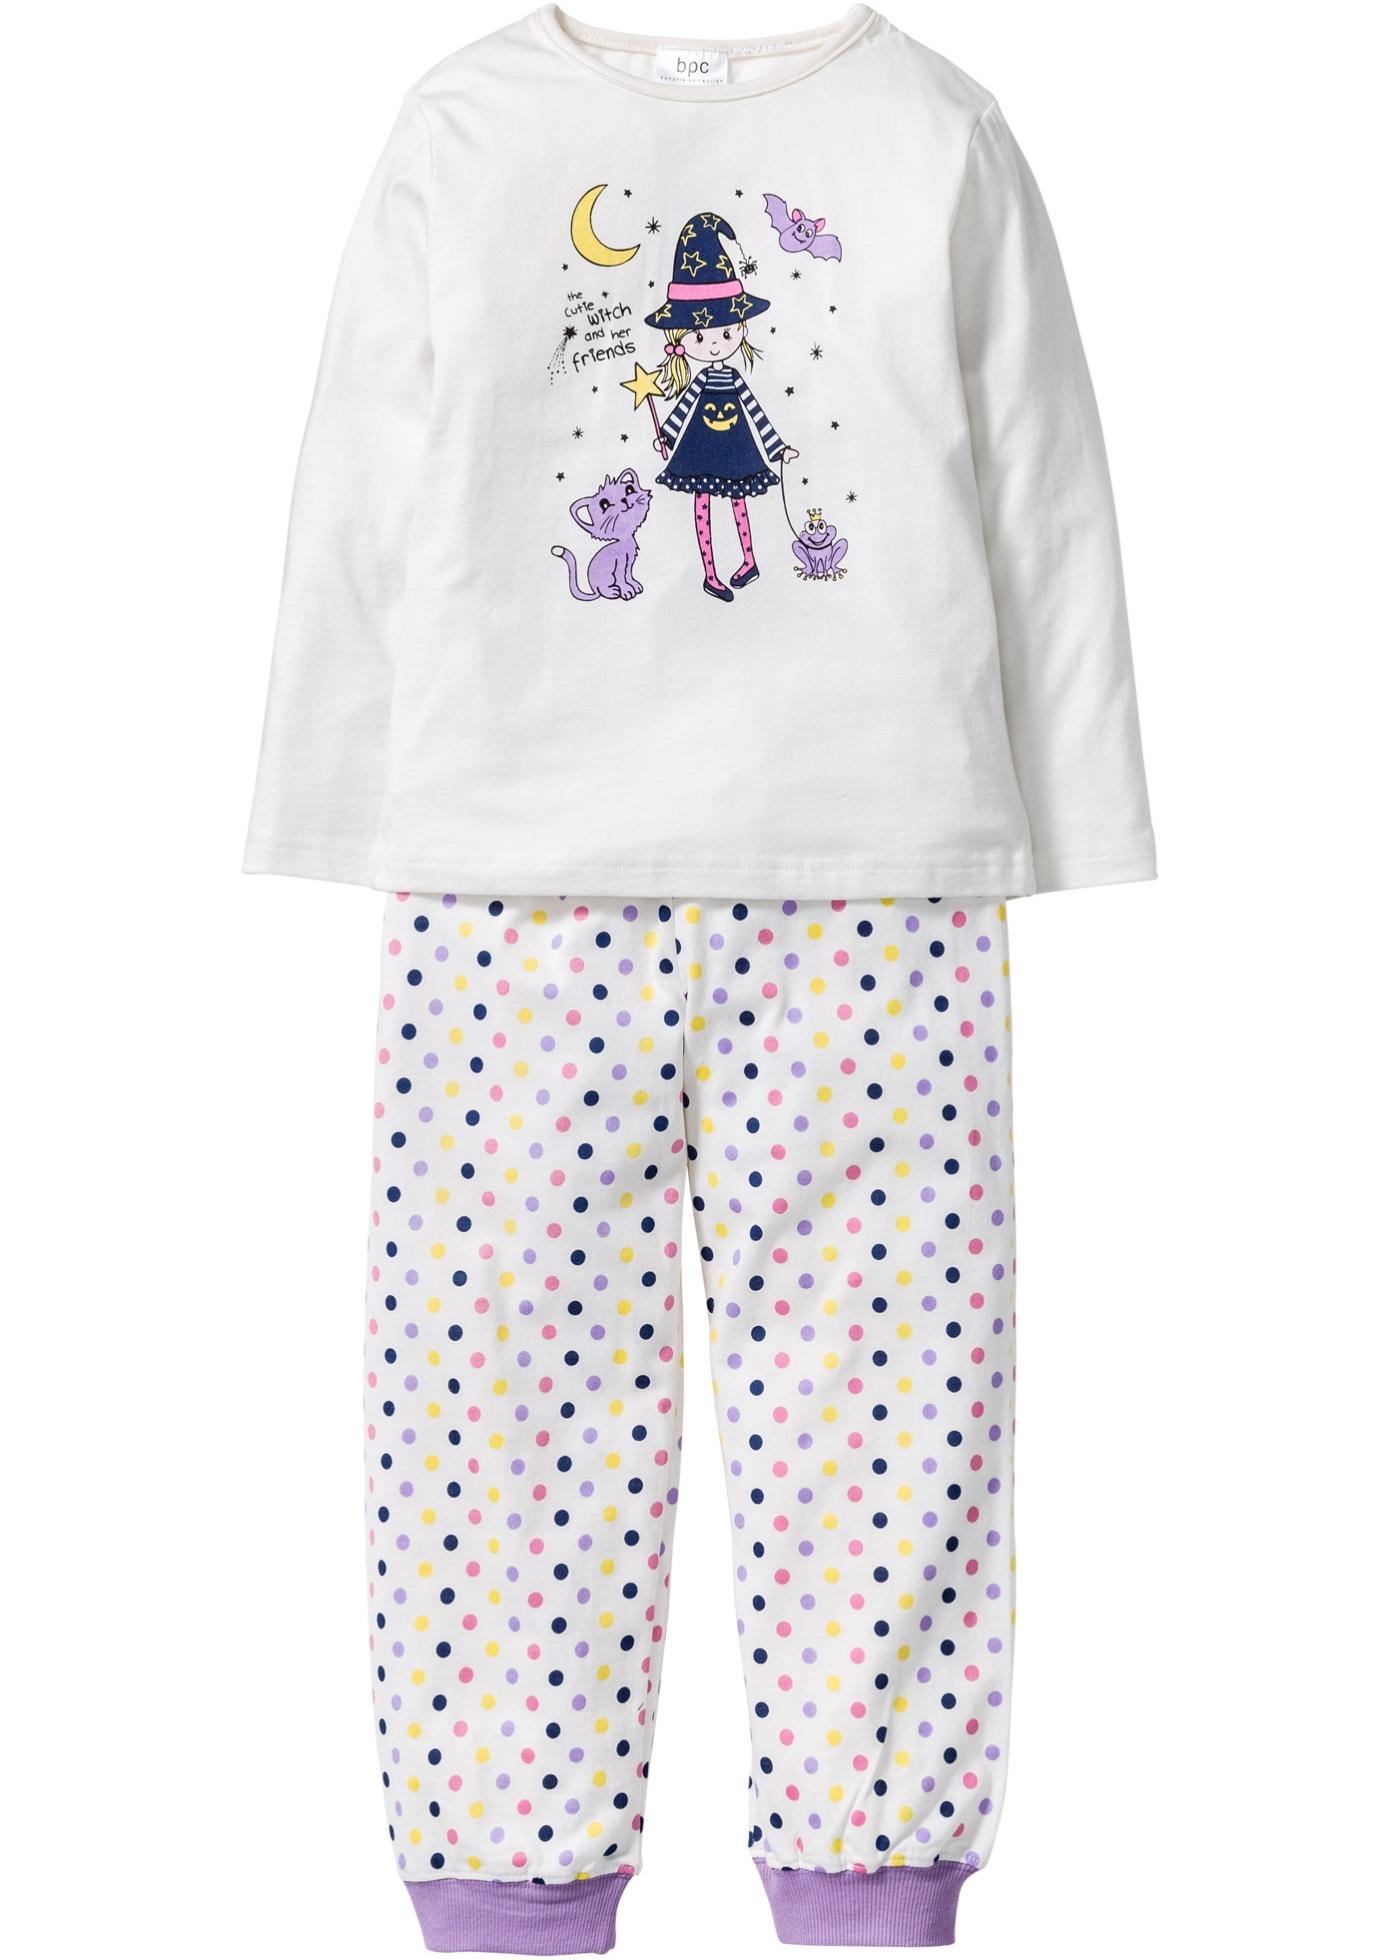 Pyjamas (2-delat set)